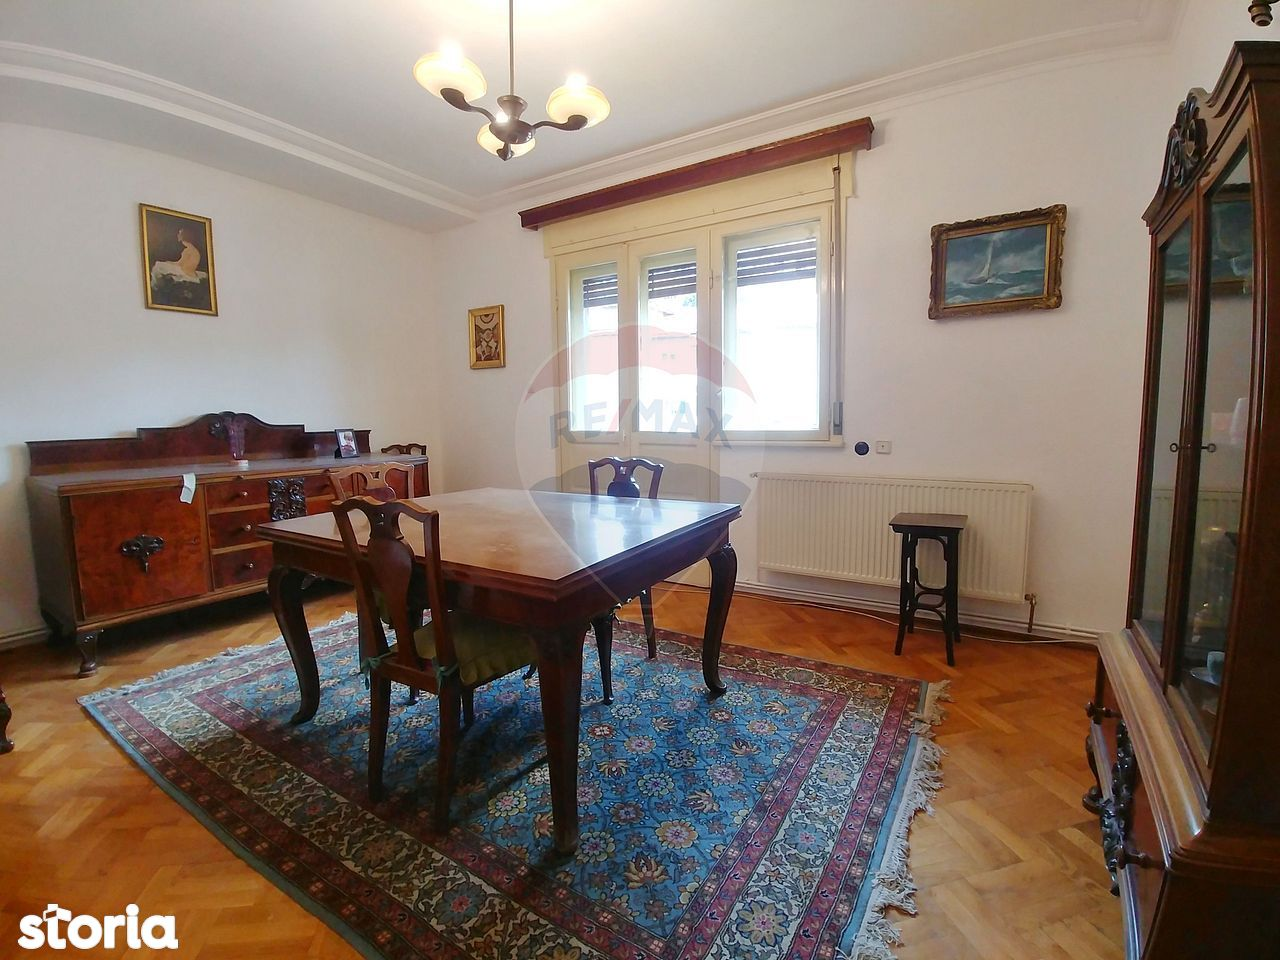 Apartament linistit si spatios cu 3 camere de inchiriat in zona Obor